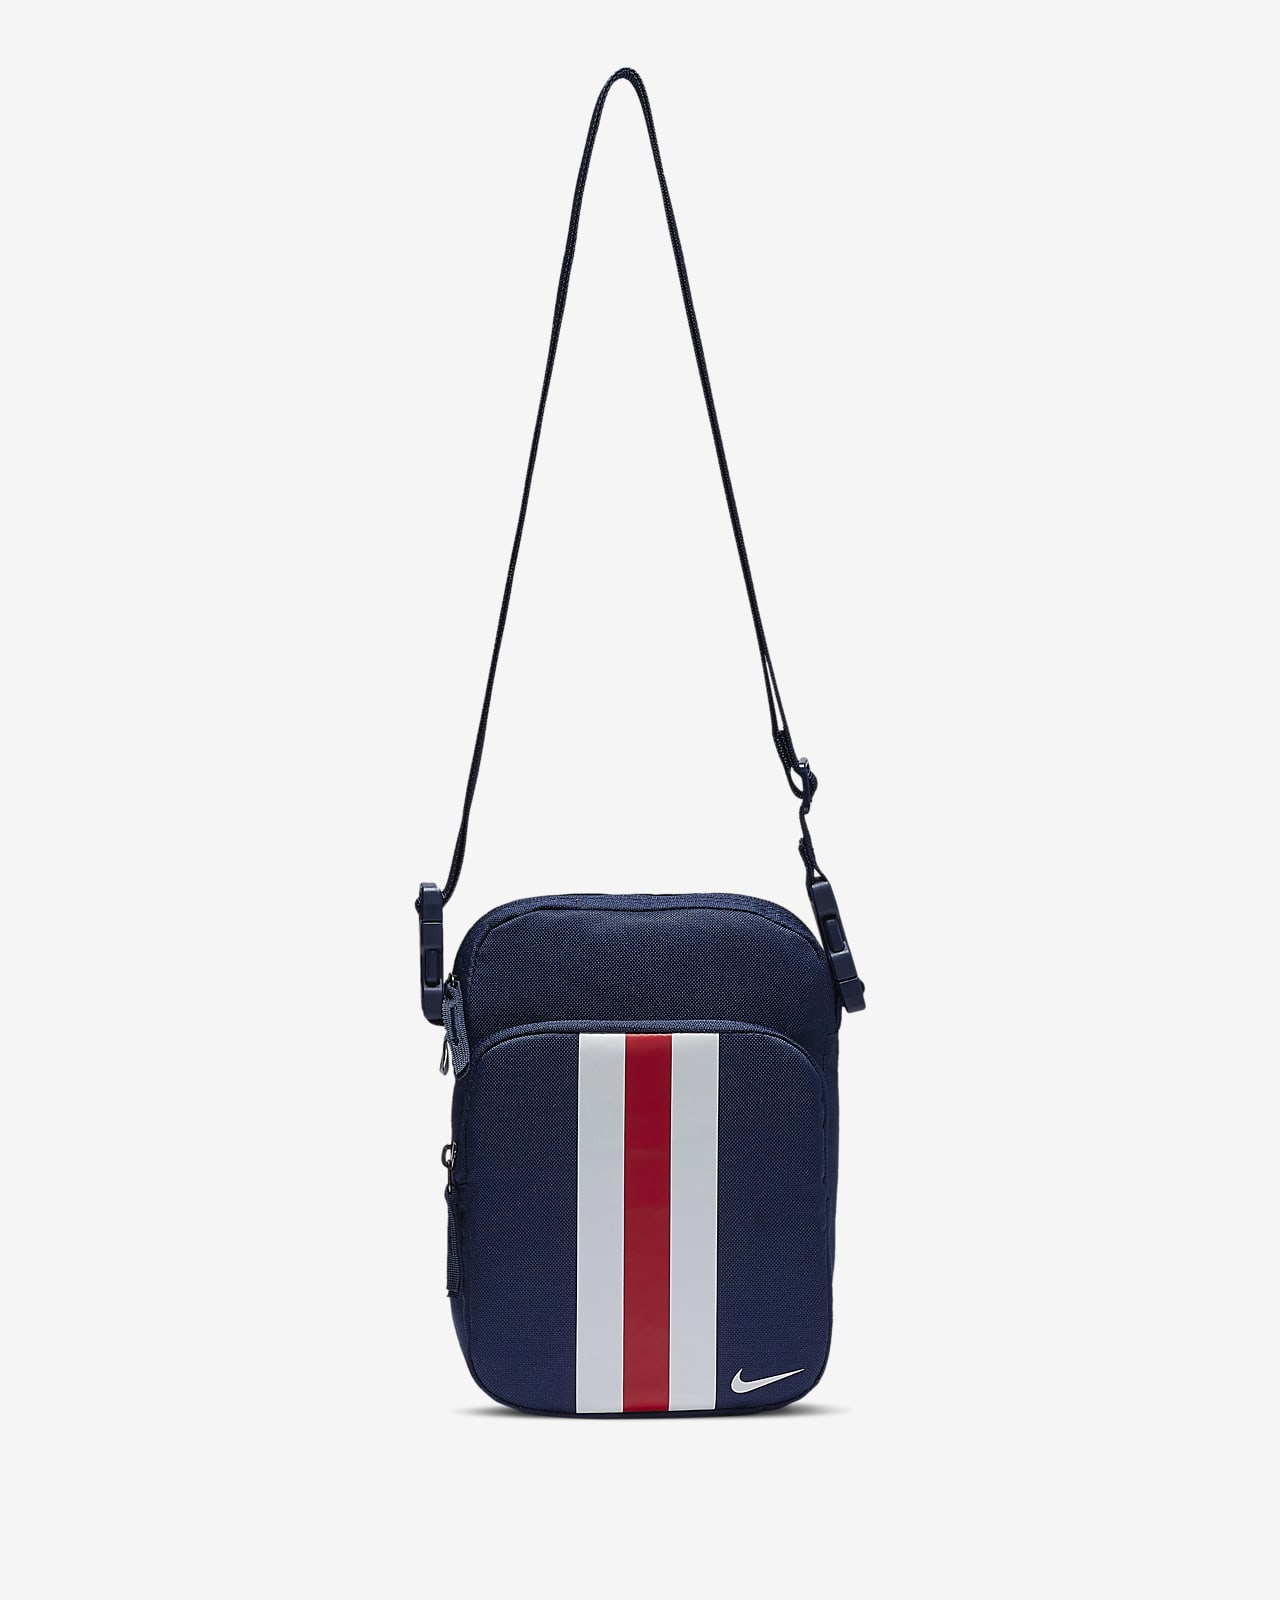 Paris Saint-Germain Stadium Small Items Bag